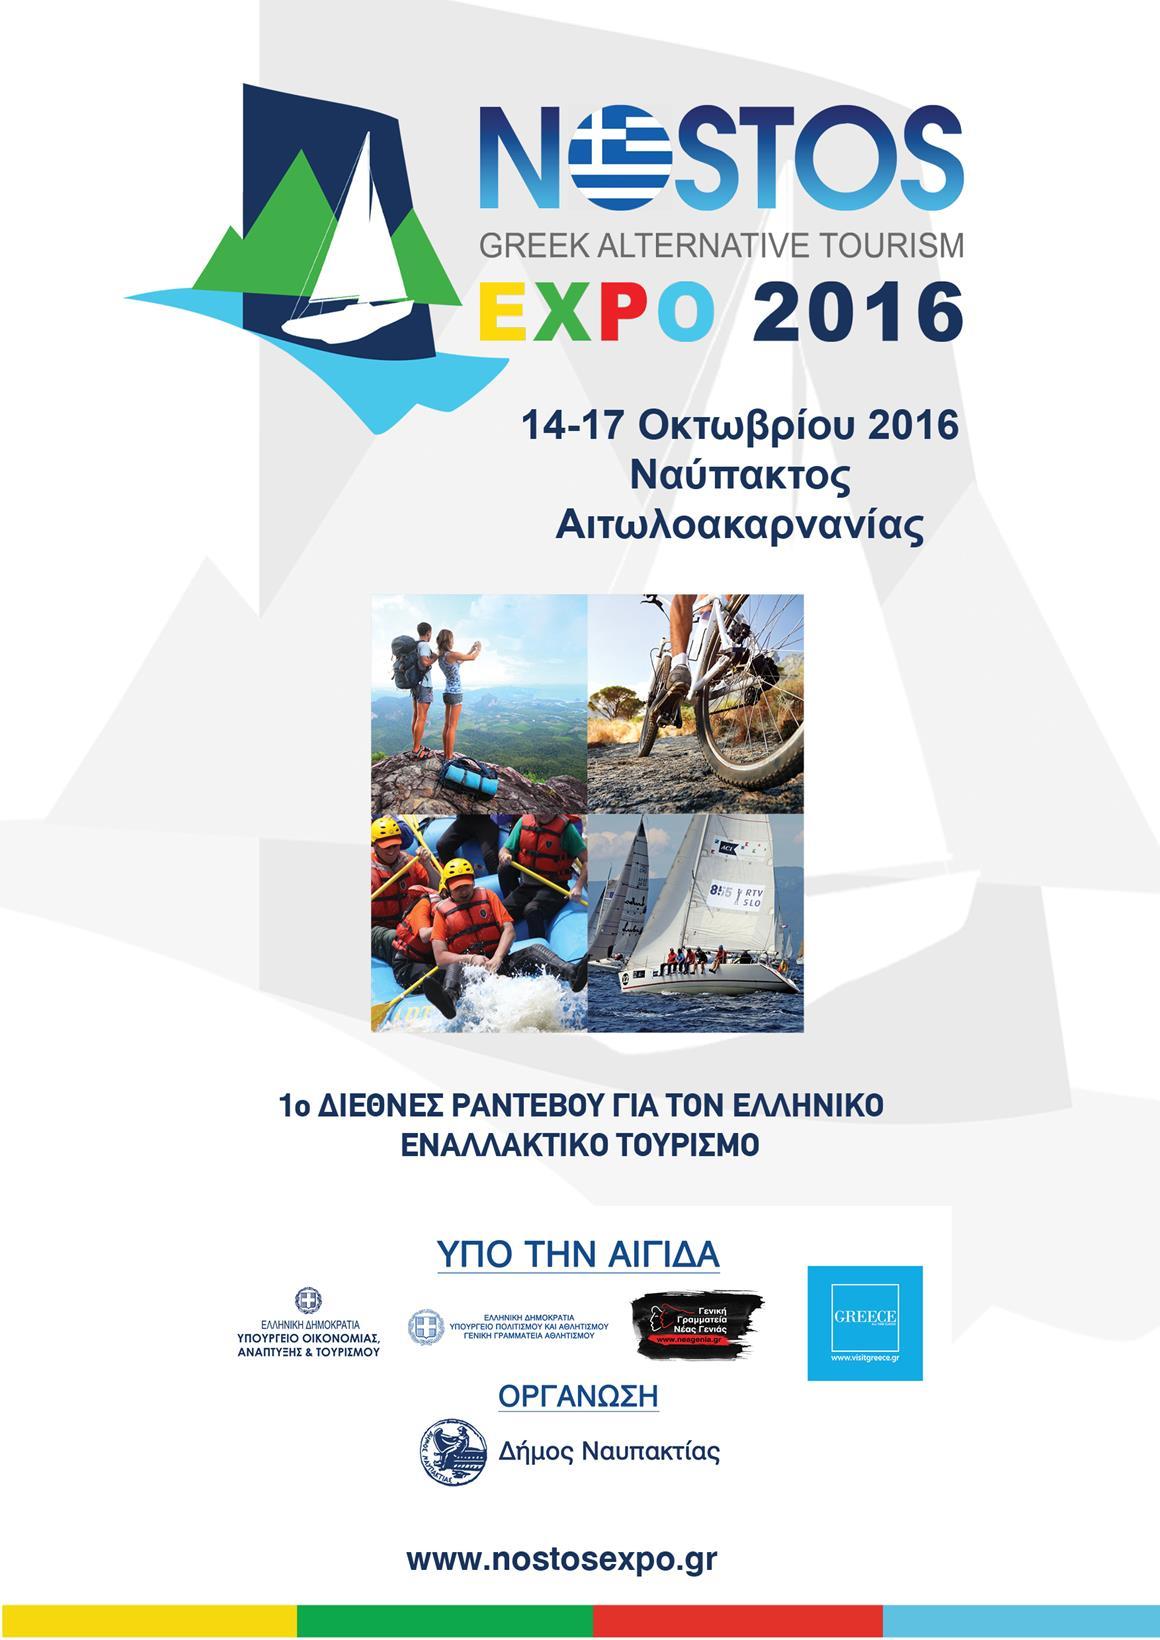 NOSTOS EXPO 2016: Πρόσκληση συμμετοχής στο εκθεσιακό περίπτερο του Επιμελητηρίου Αιτωλοακαρνανίας